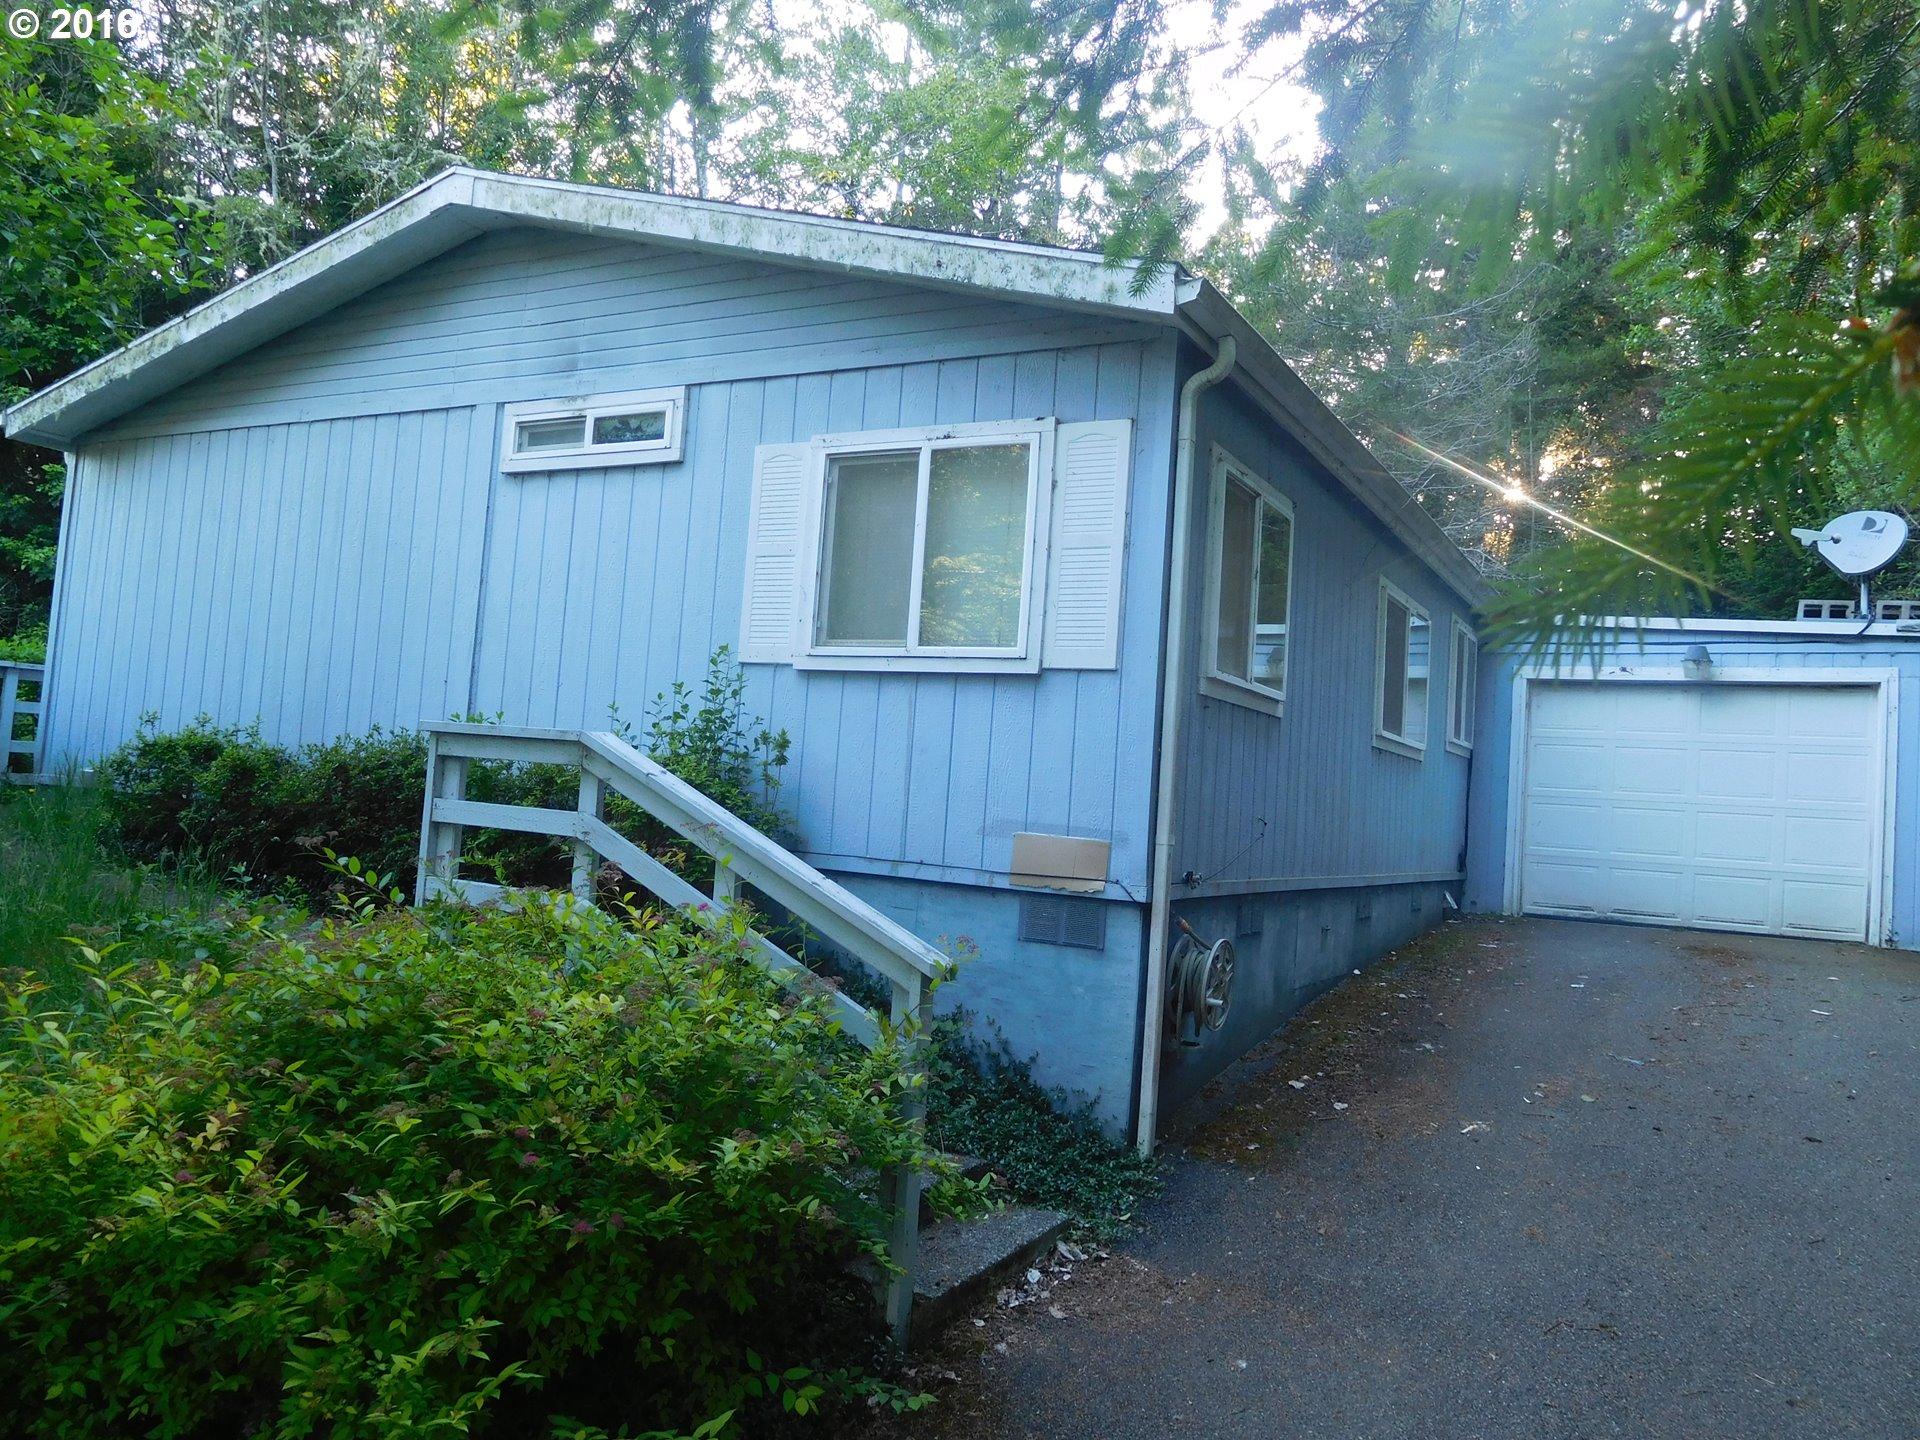 550 BONNEVILLE RD, Lakeside OR 97449